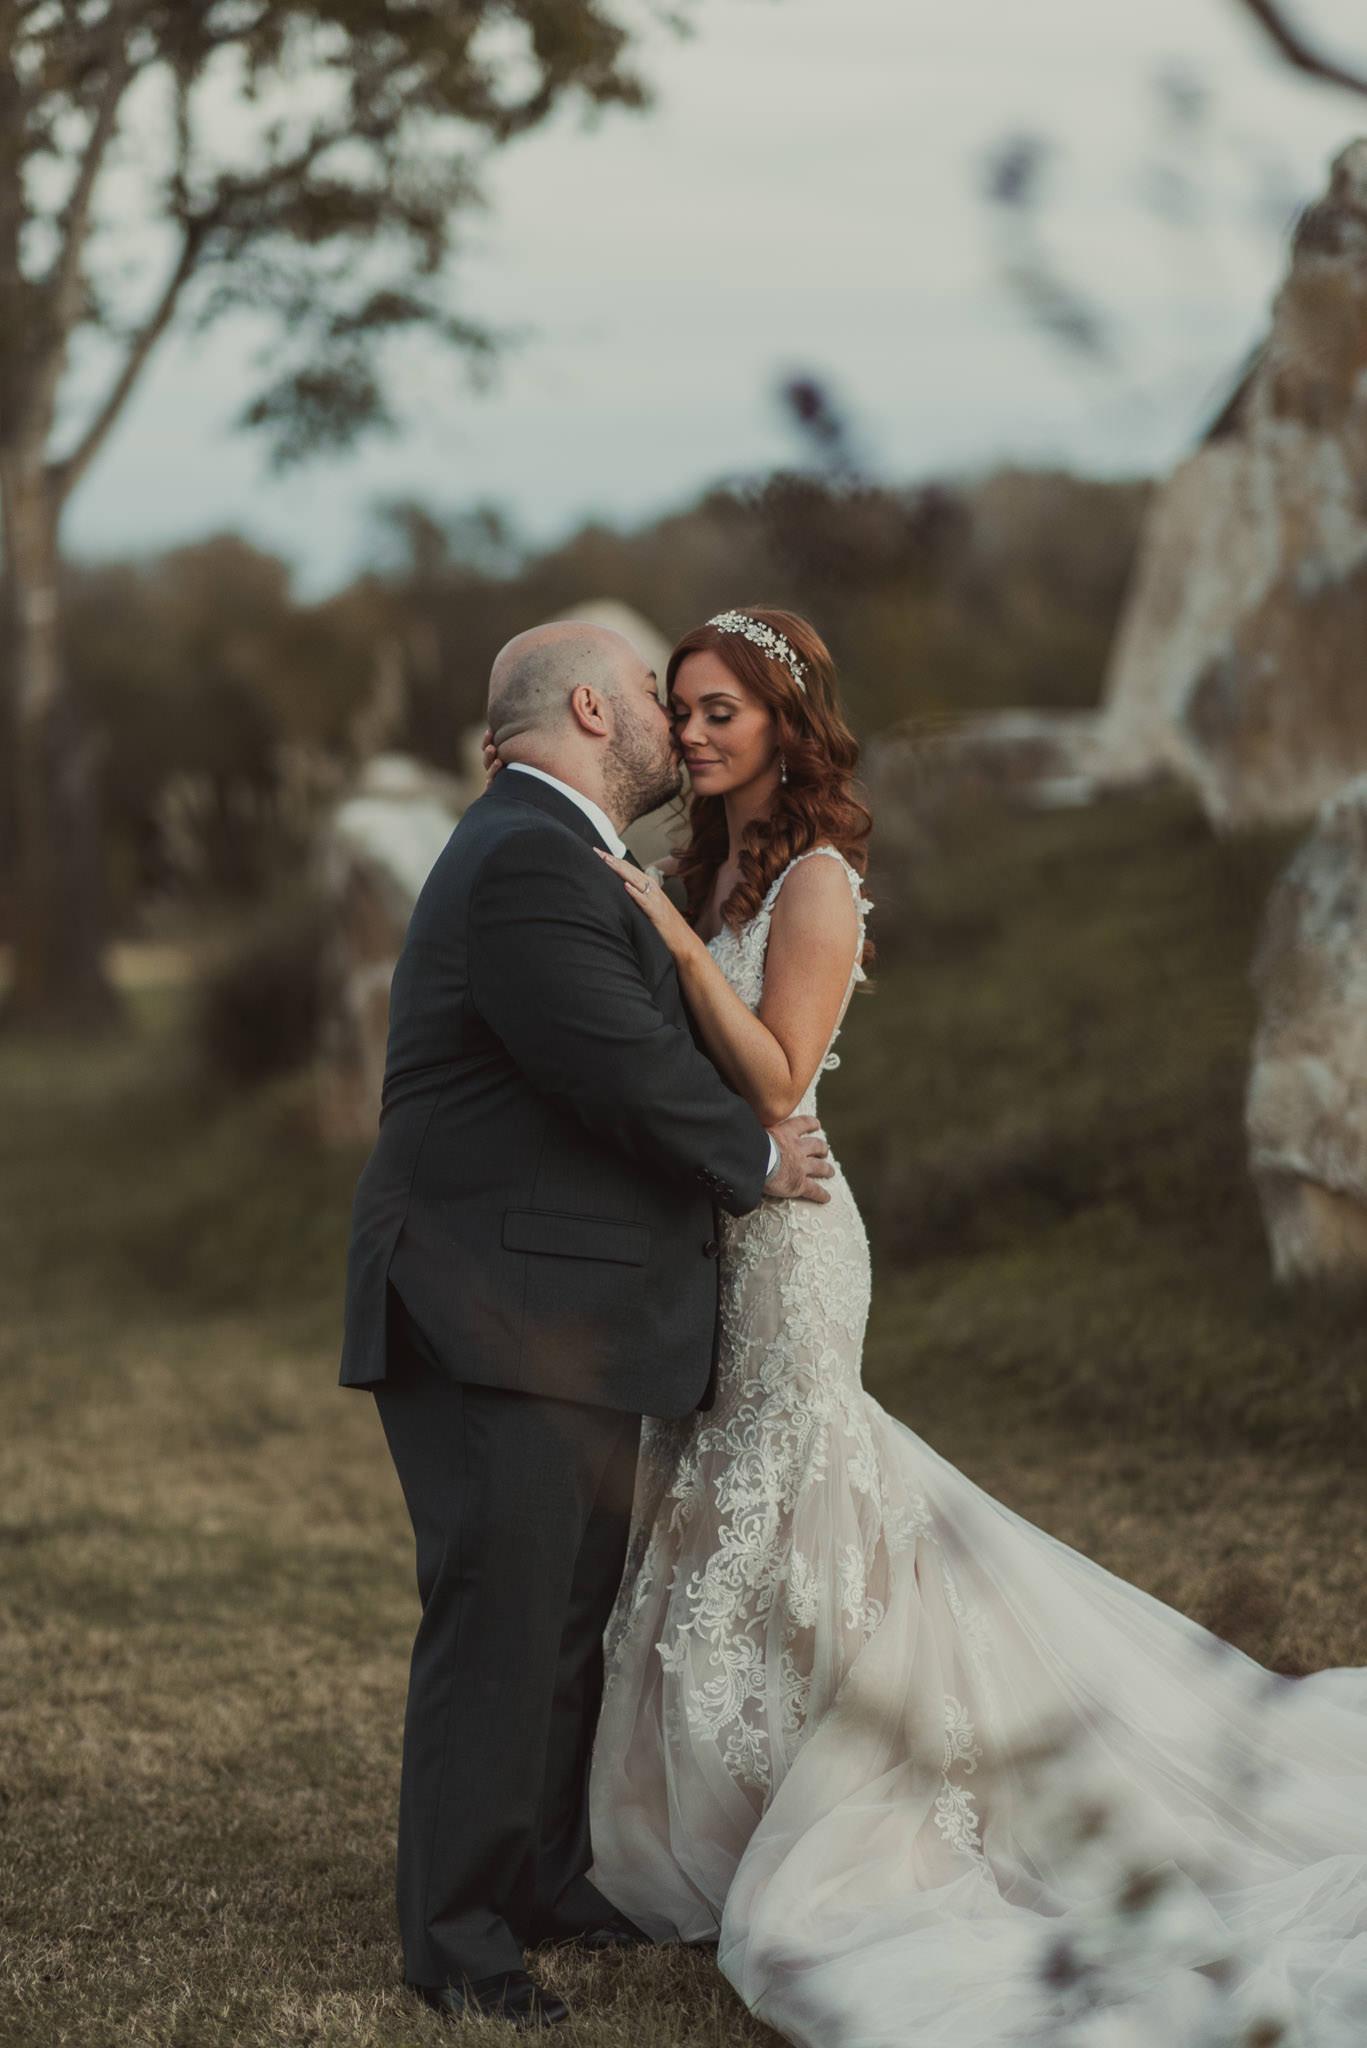 Cynthia-Curtis-Olde-Dobbine-Station-Houston-Wedding-Photographer-sm-81.jpg